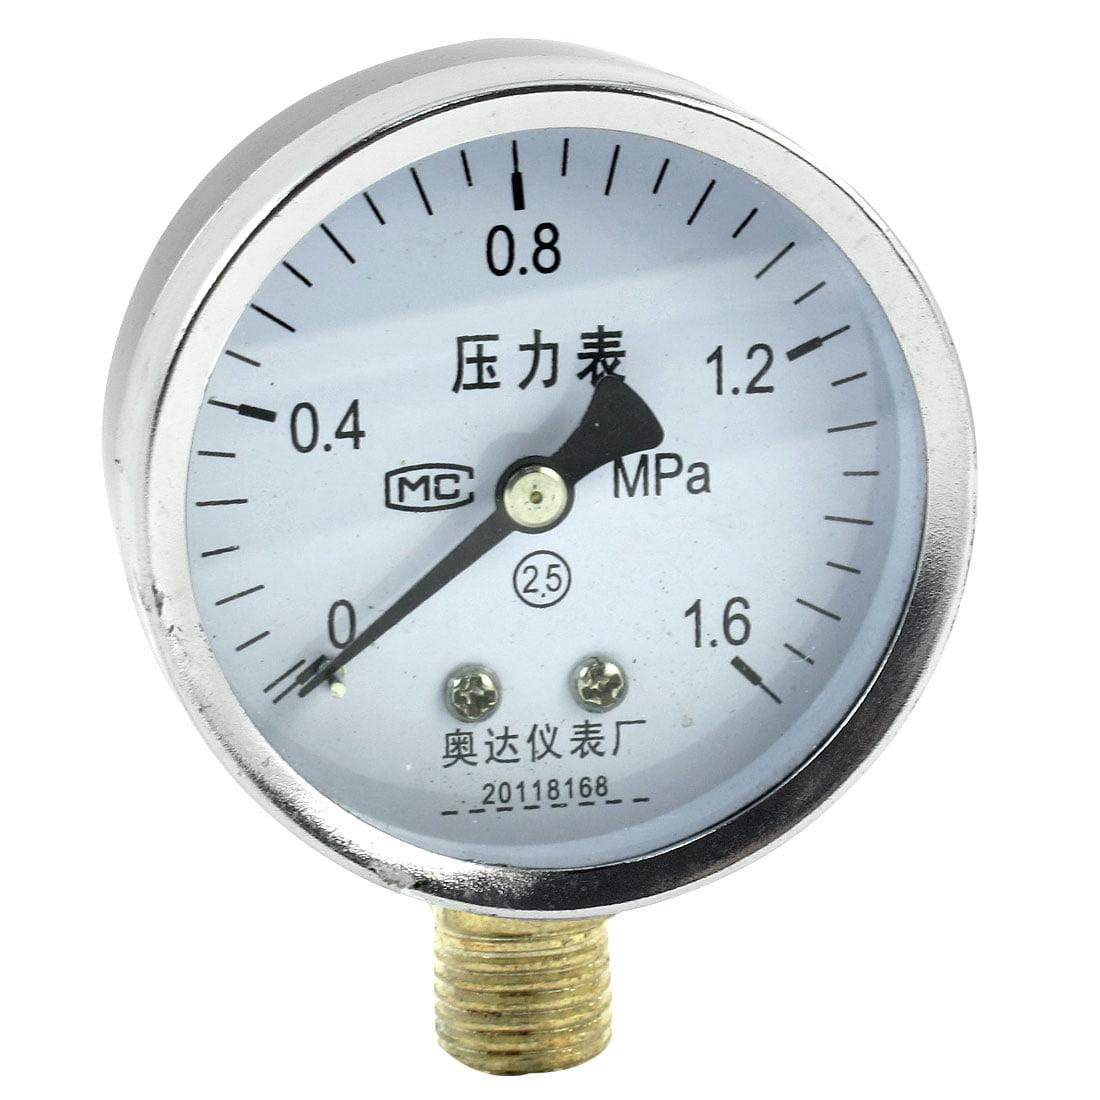 6mpa dial type air pressure gauge silver tone black walmart com